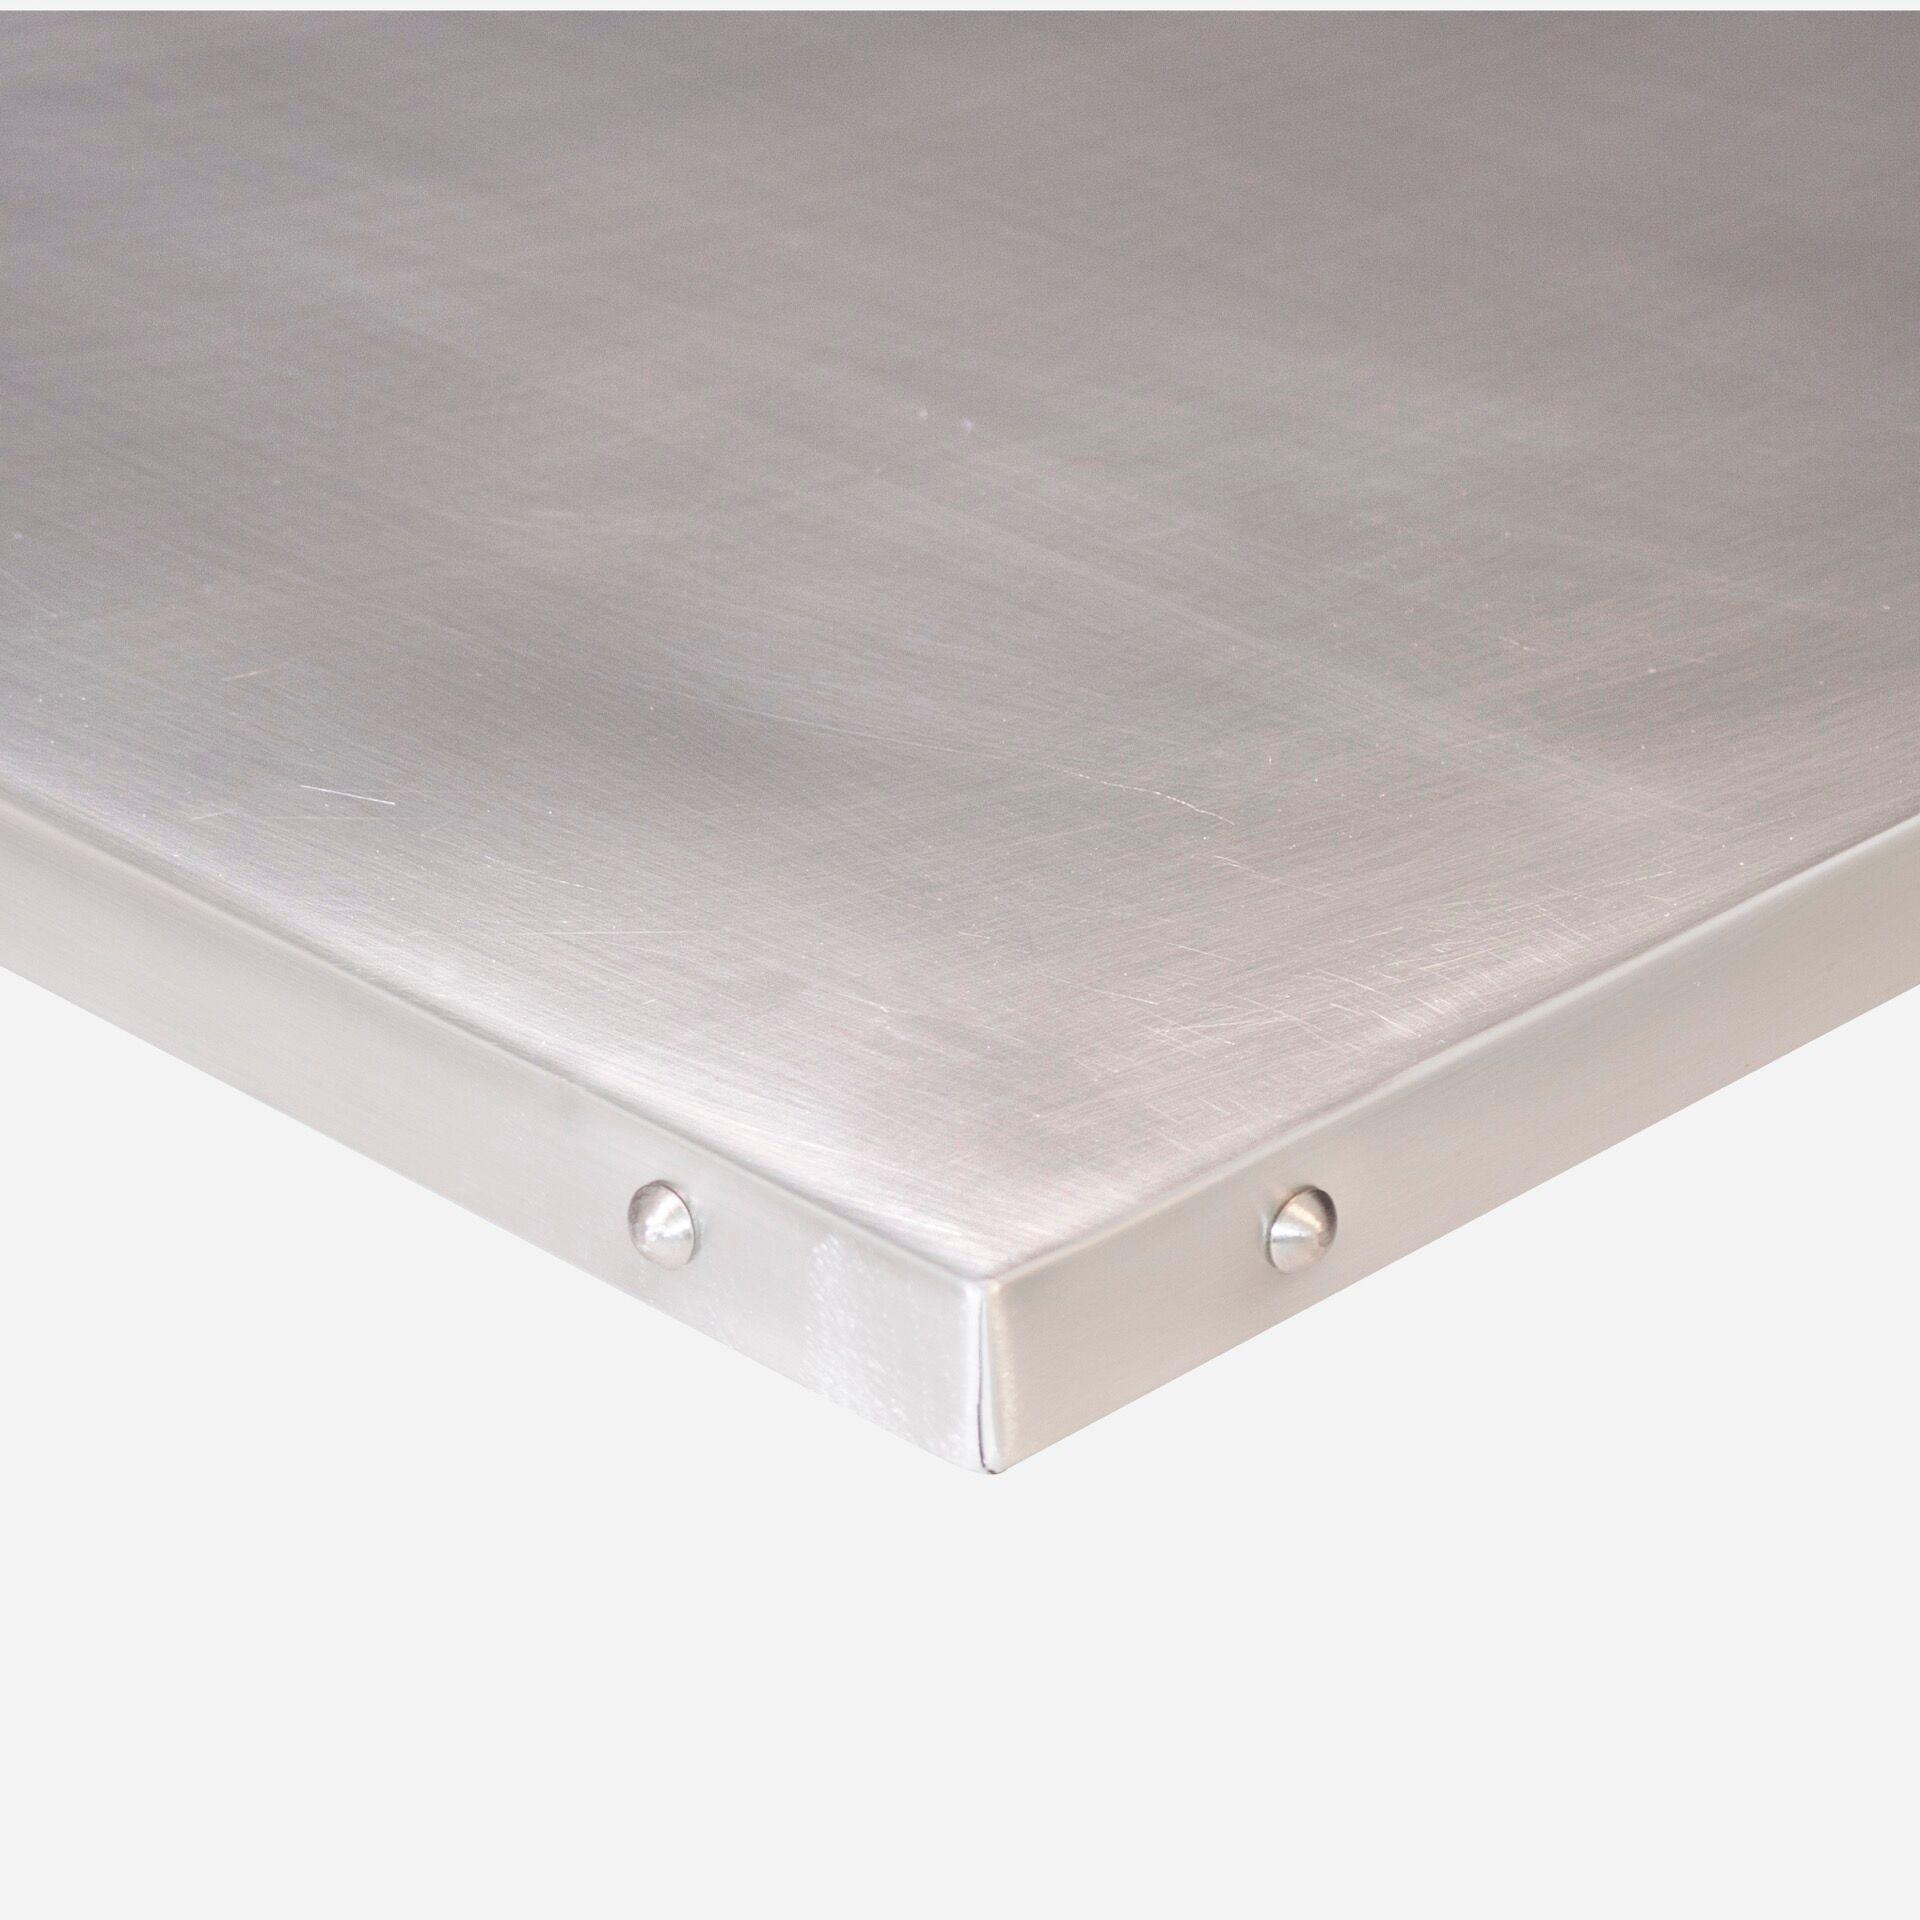 TT Patina Table Top Natural Zinc with tacked edge copy